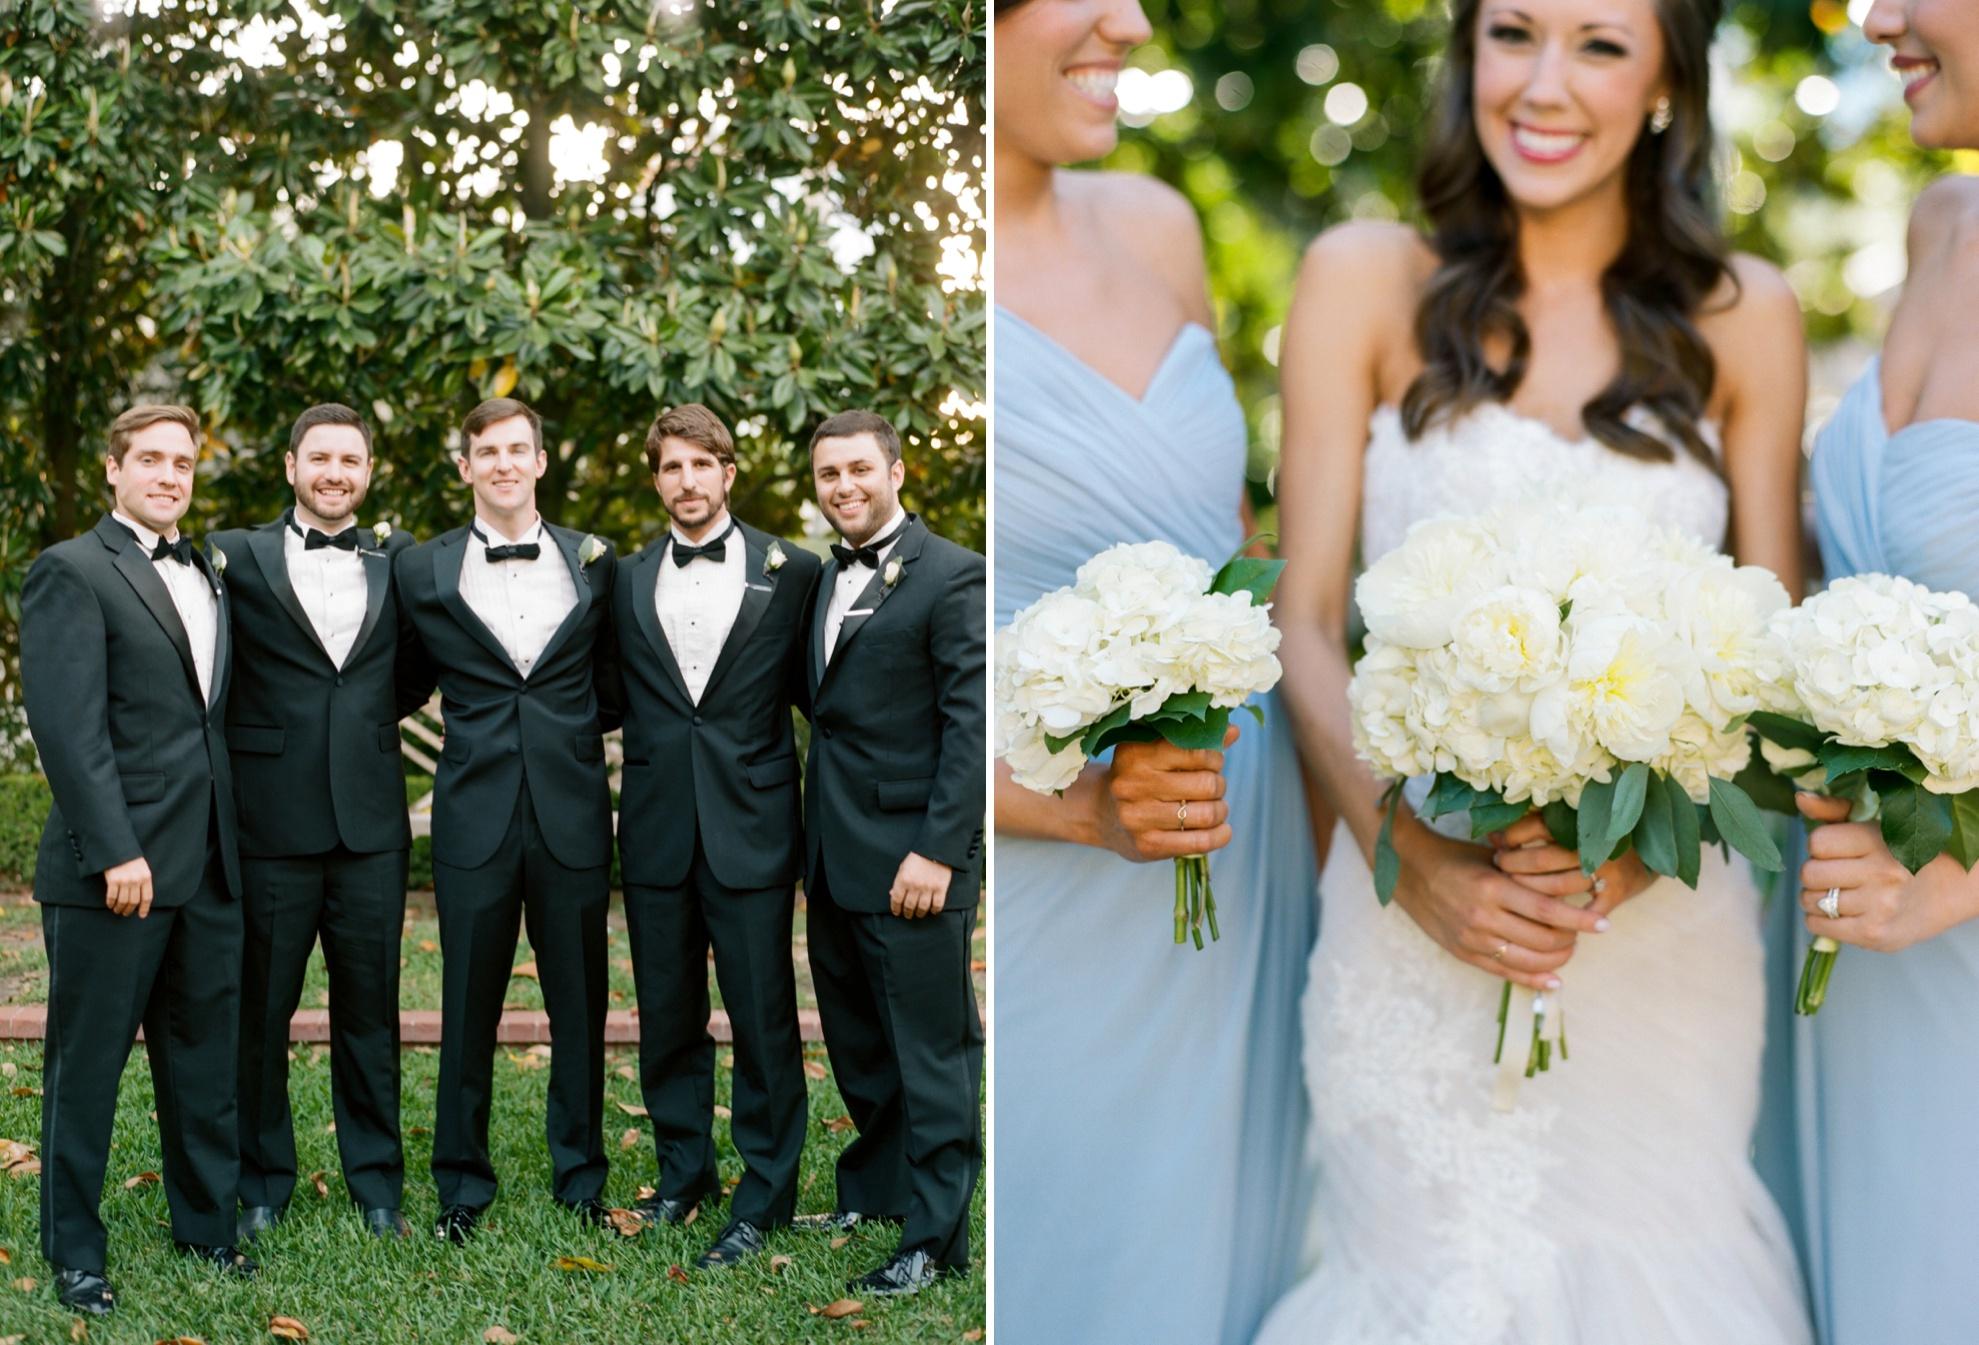 The-Junior-League-Houston-Chapter-Wedding-Reception-Dana-Fernandez-Photography-Film-Venue-6.jpg